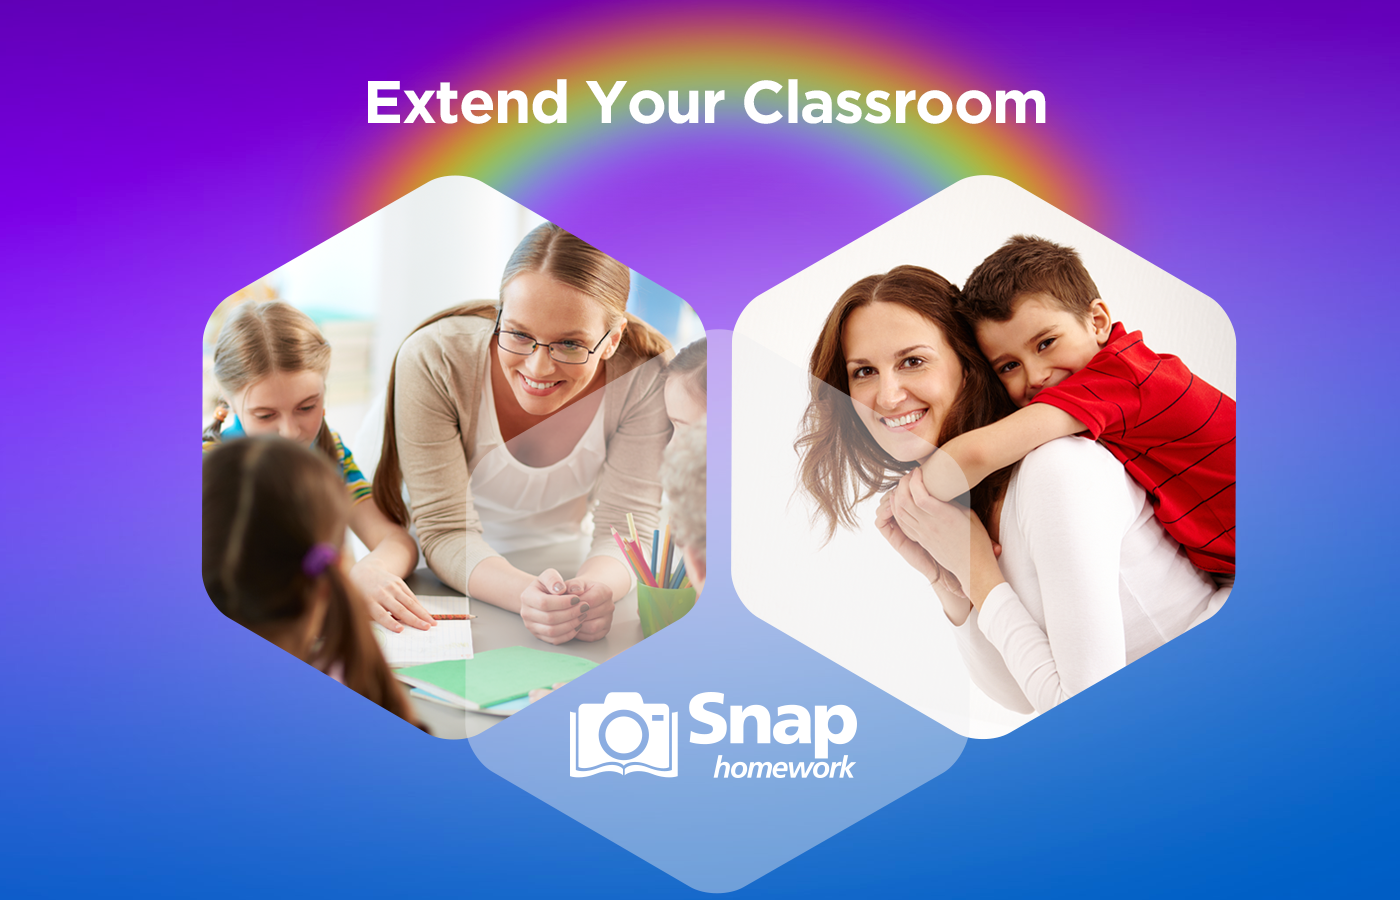 Pin by SnapWorks on About Snap Homework App Homework app